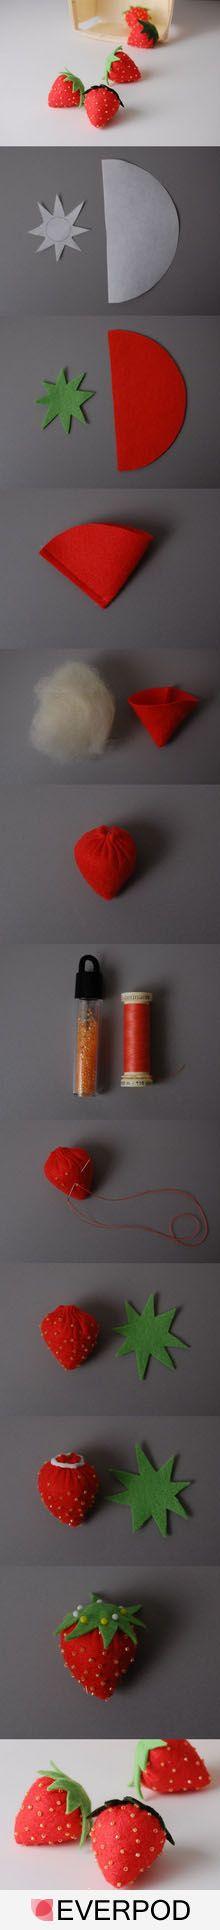 strawberry pincushion tutorial